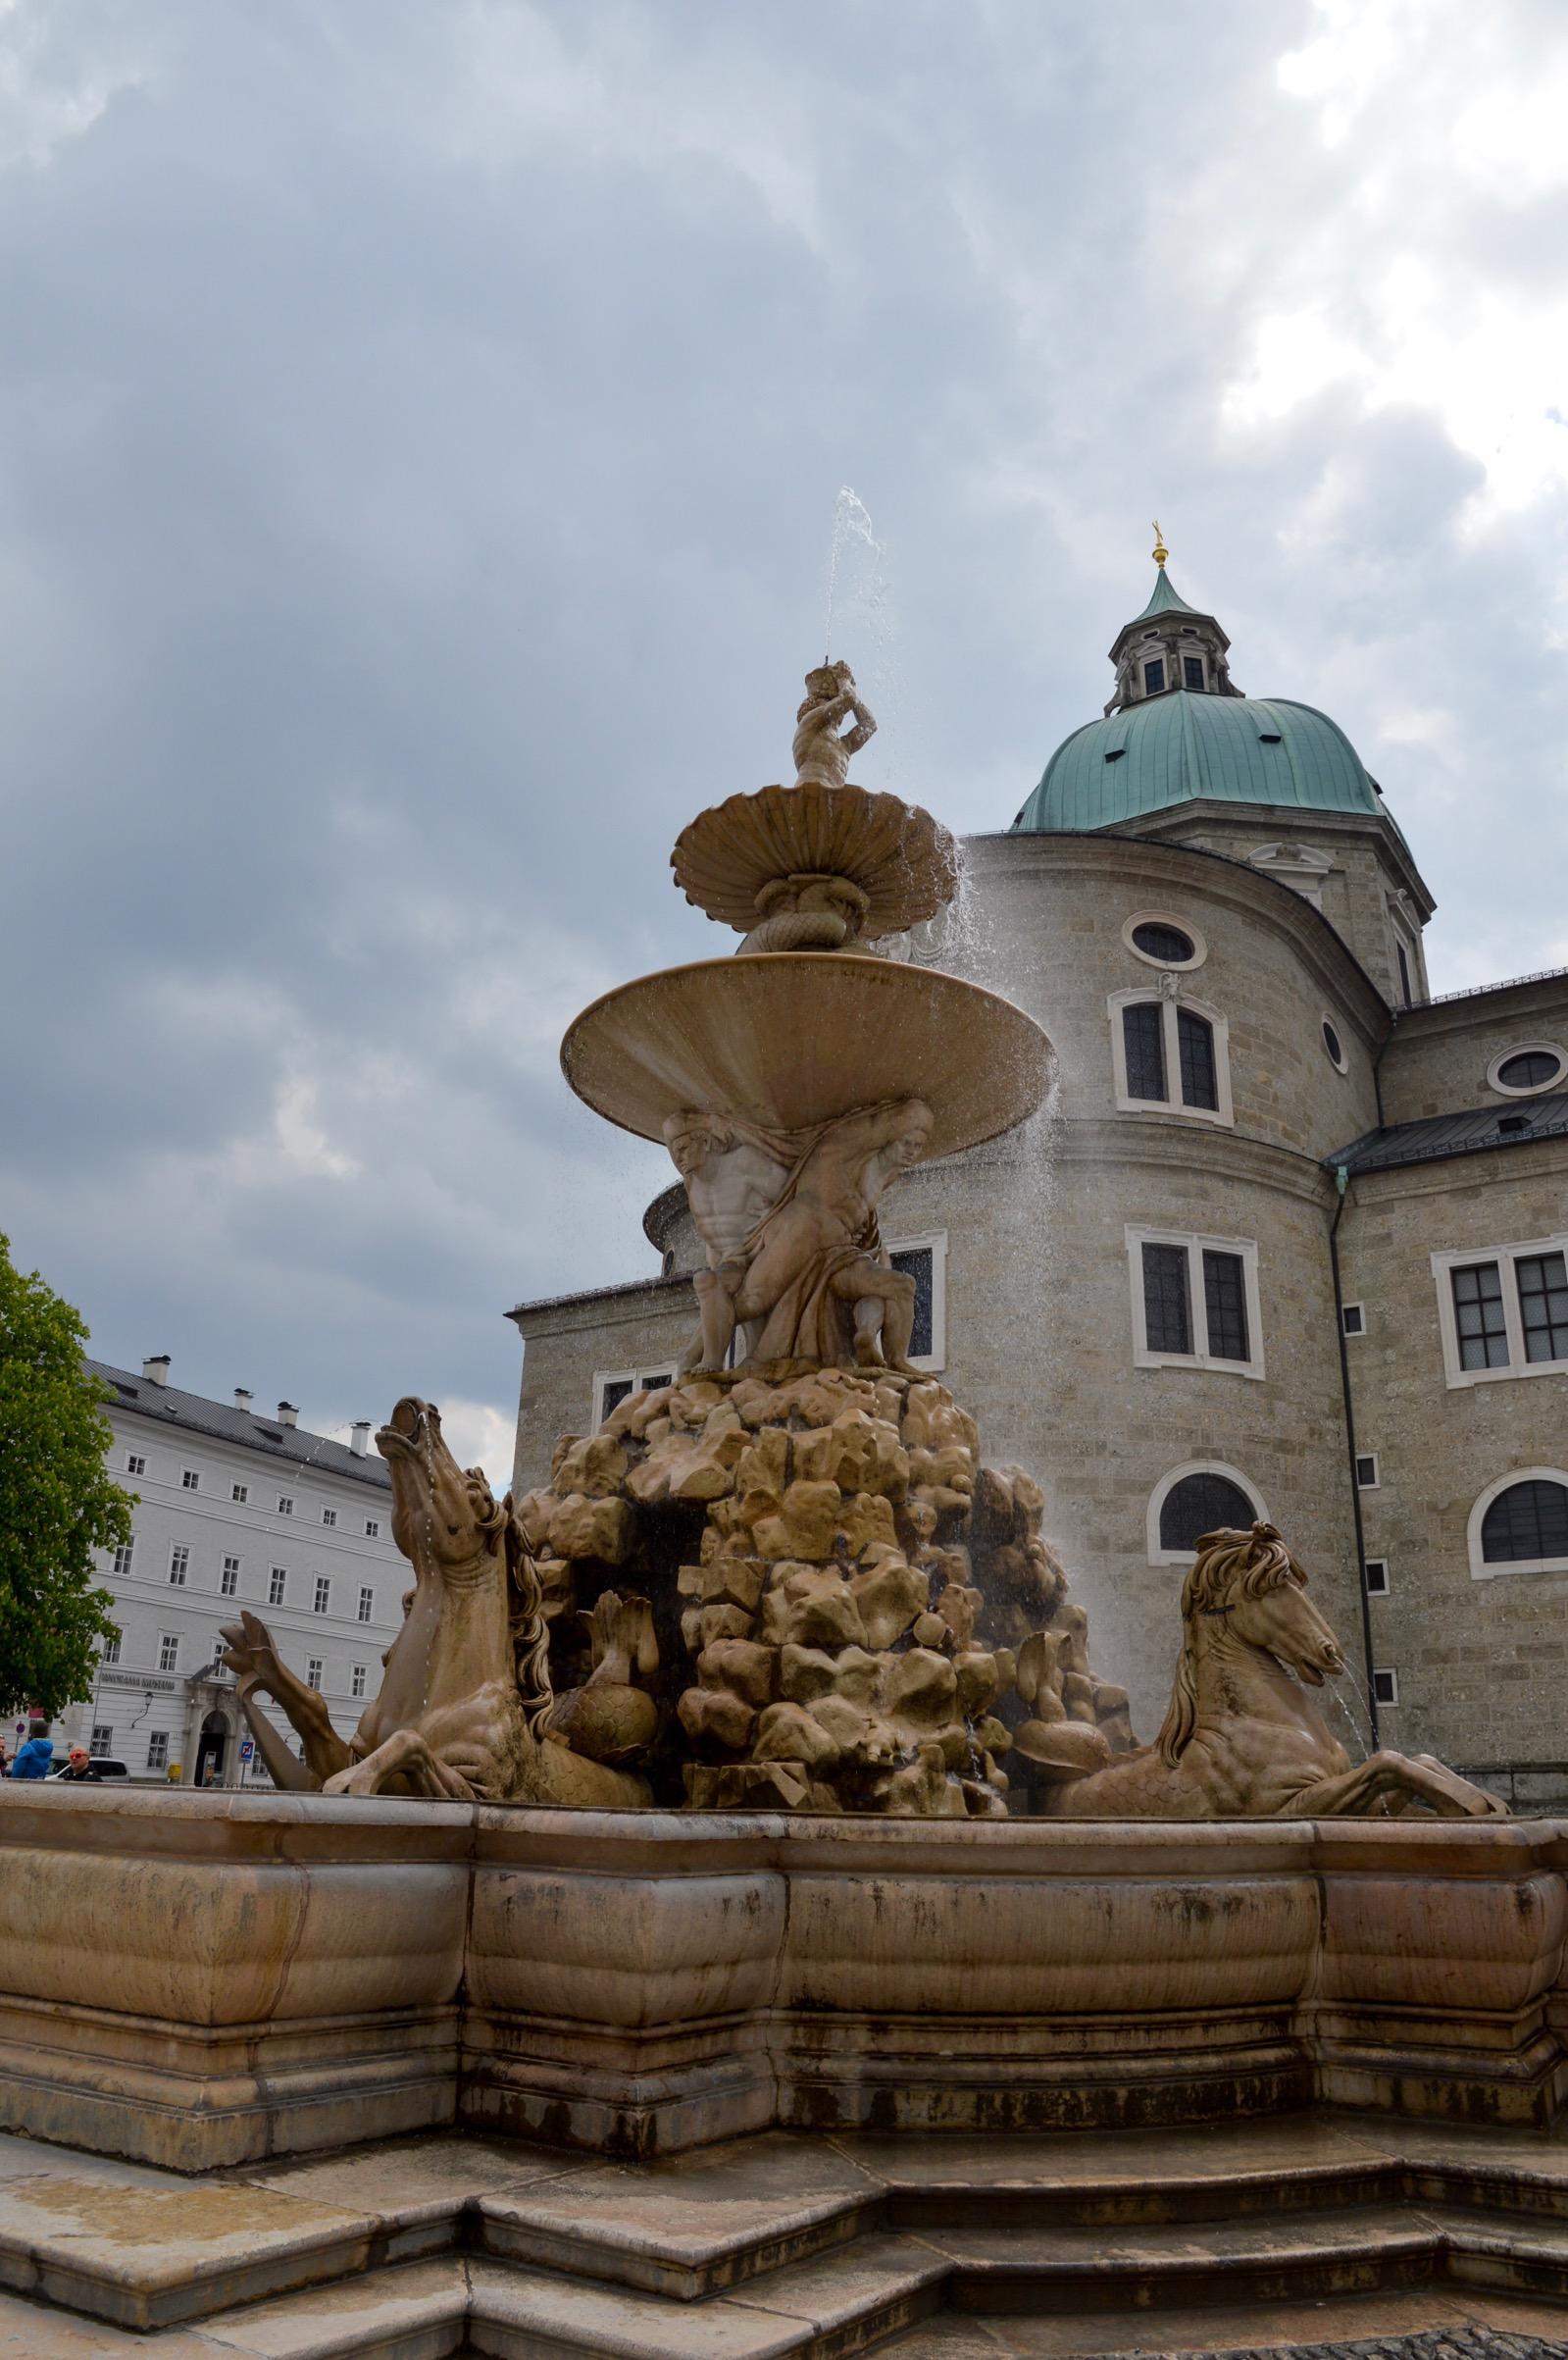 Residenzbrunnen (fountain), Residenzplatz, Salzburg, Austria